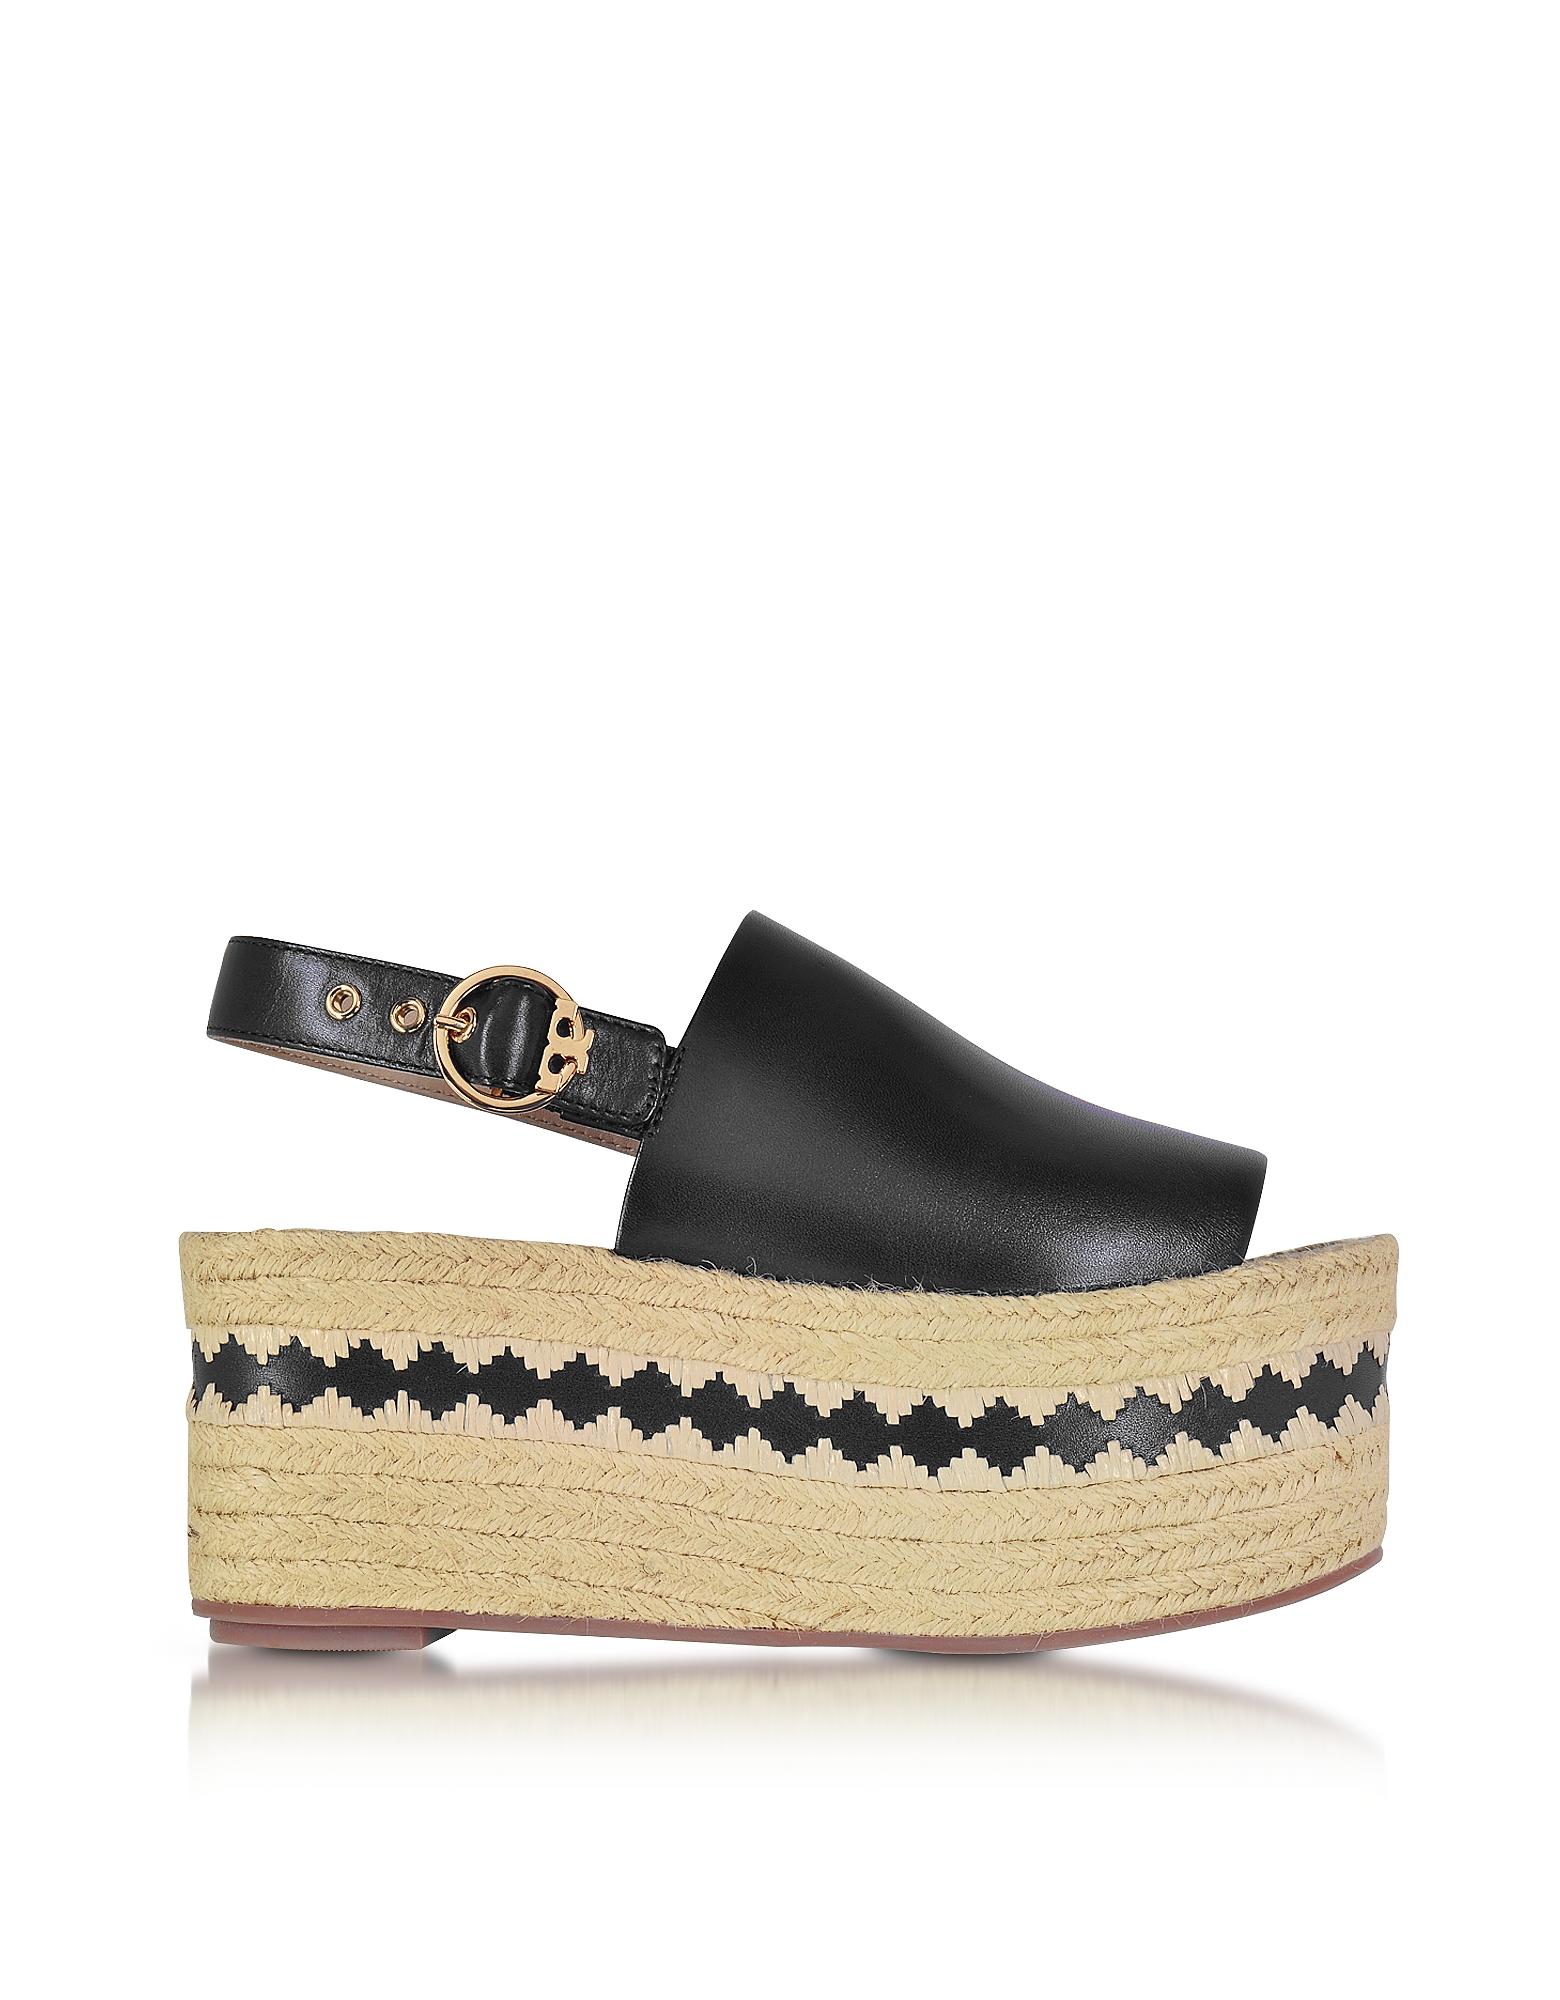 Tory Burch Shoes, Dandy Black Veg Leather Wedge Espadrille Sandal